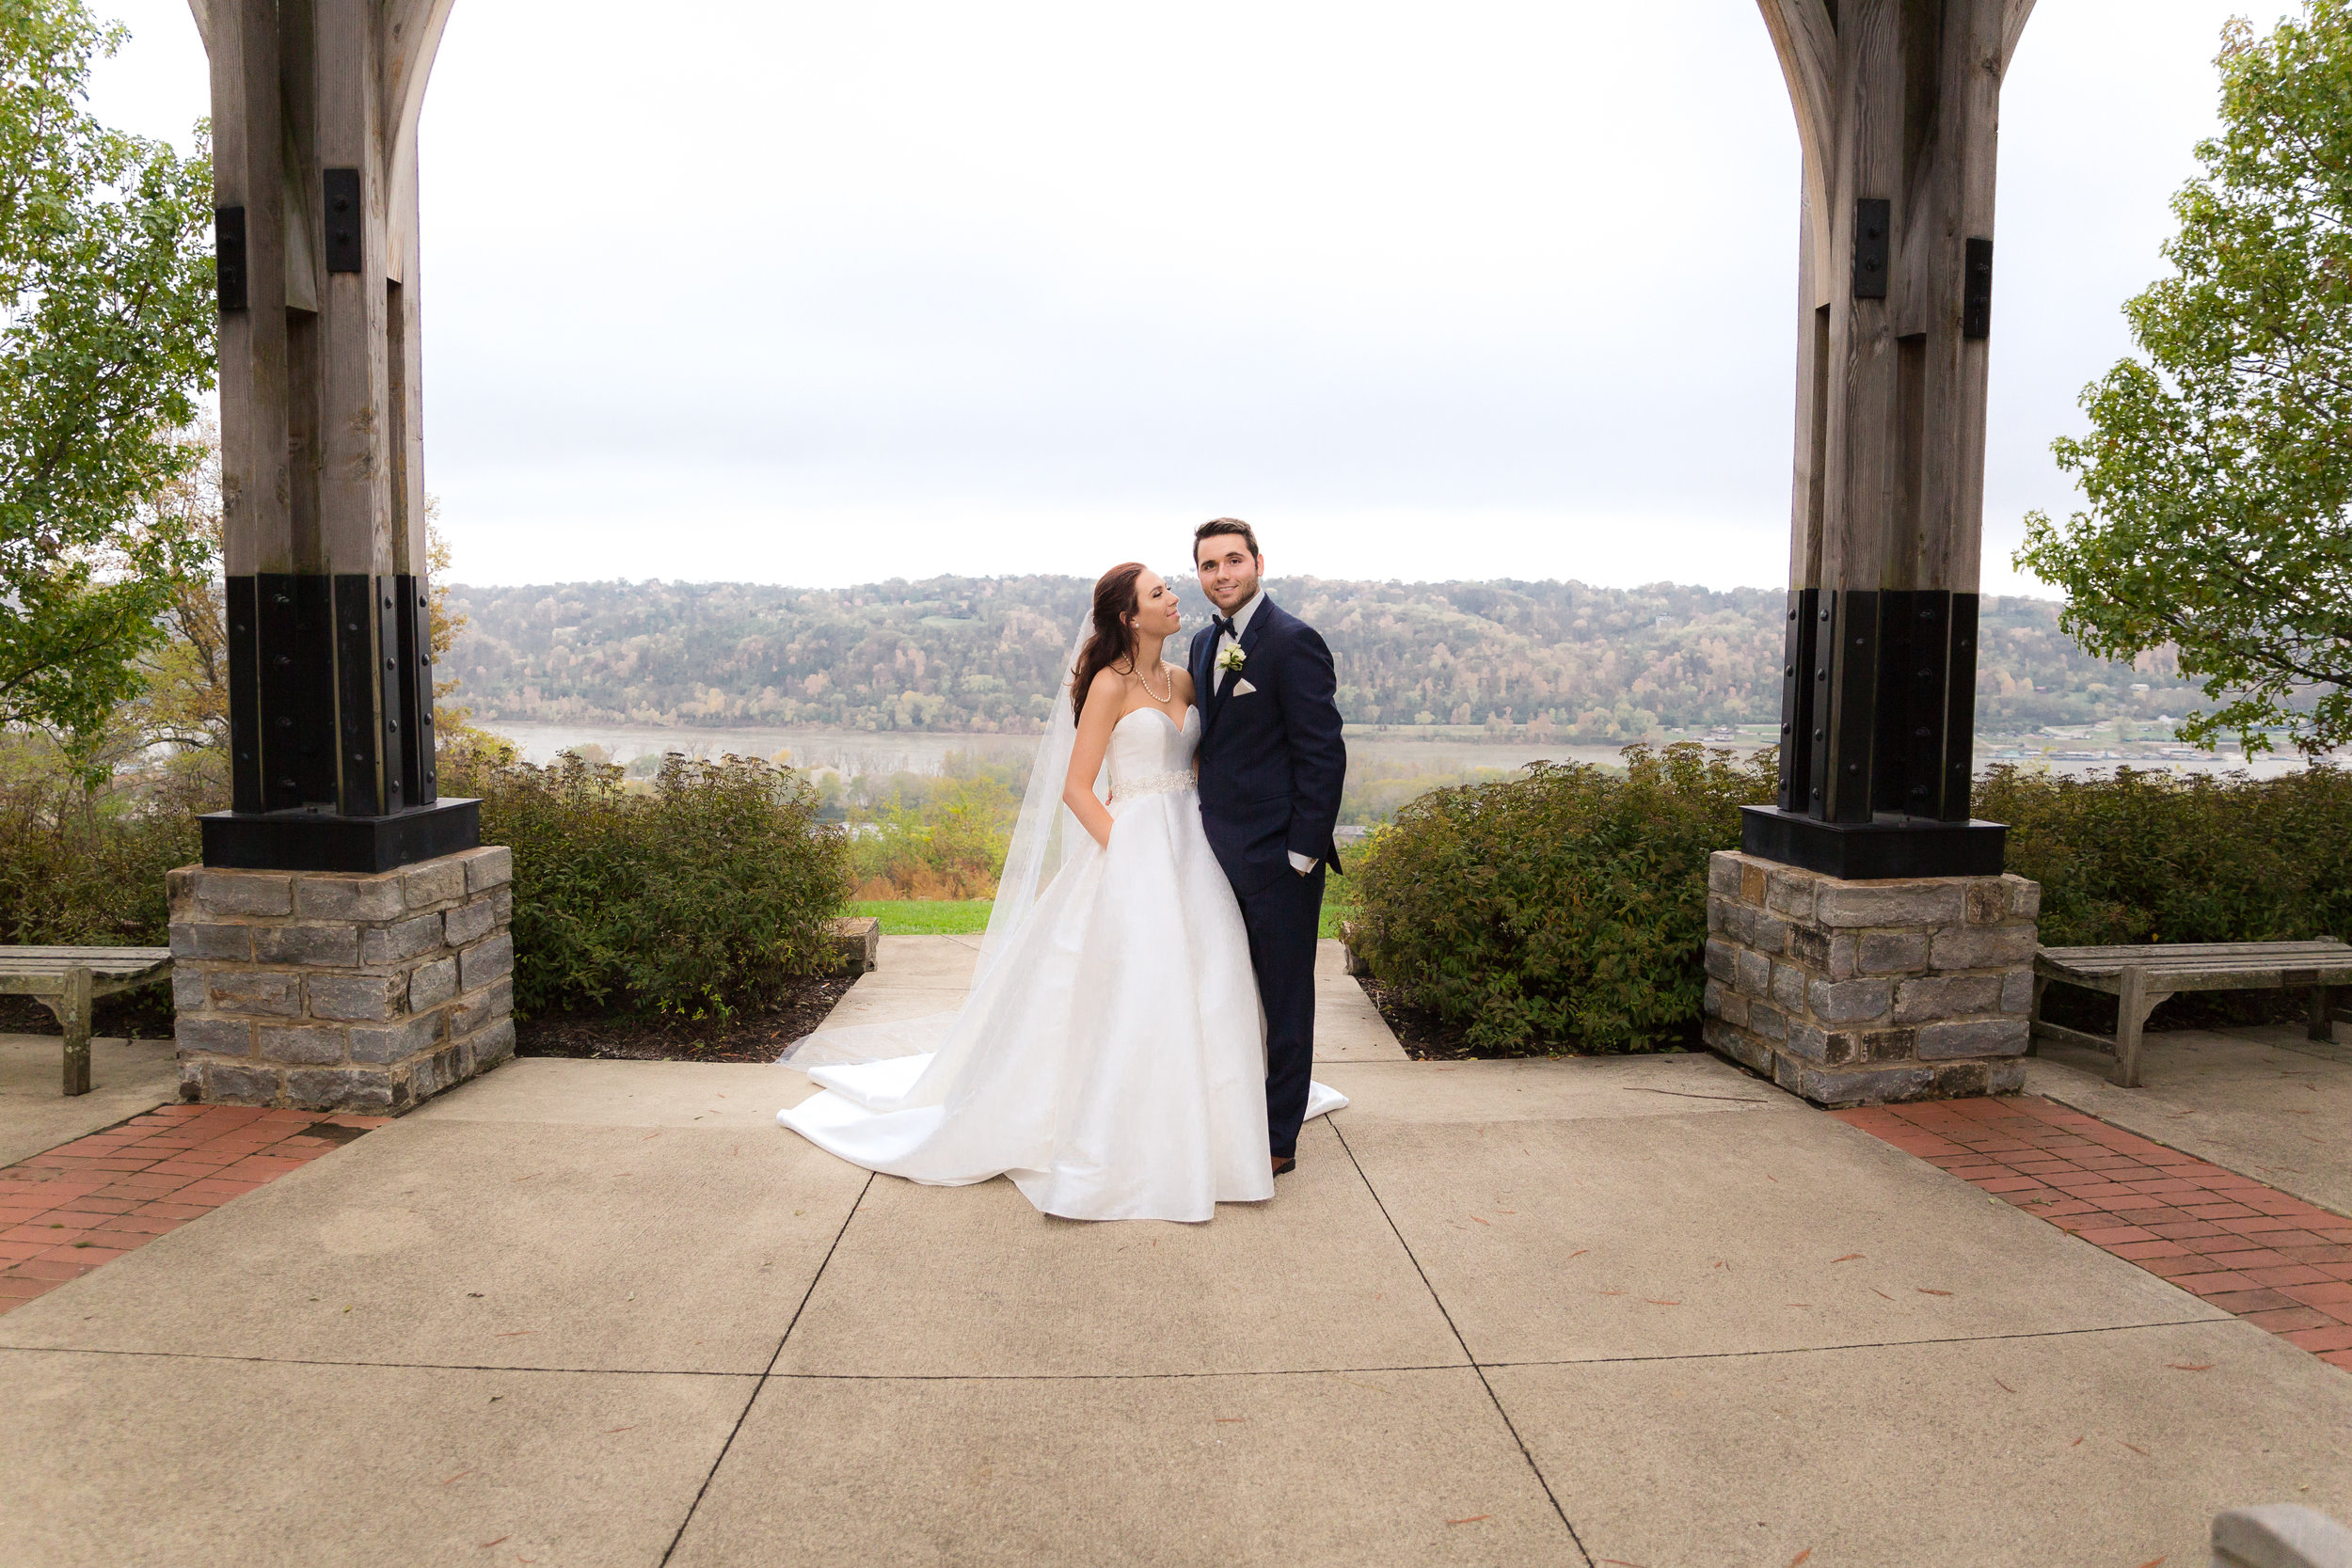 Alms Park Weddings